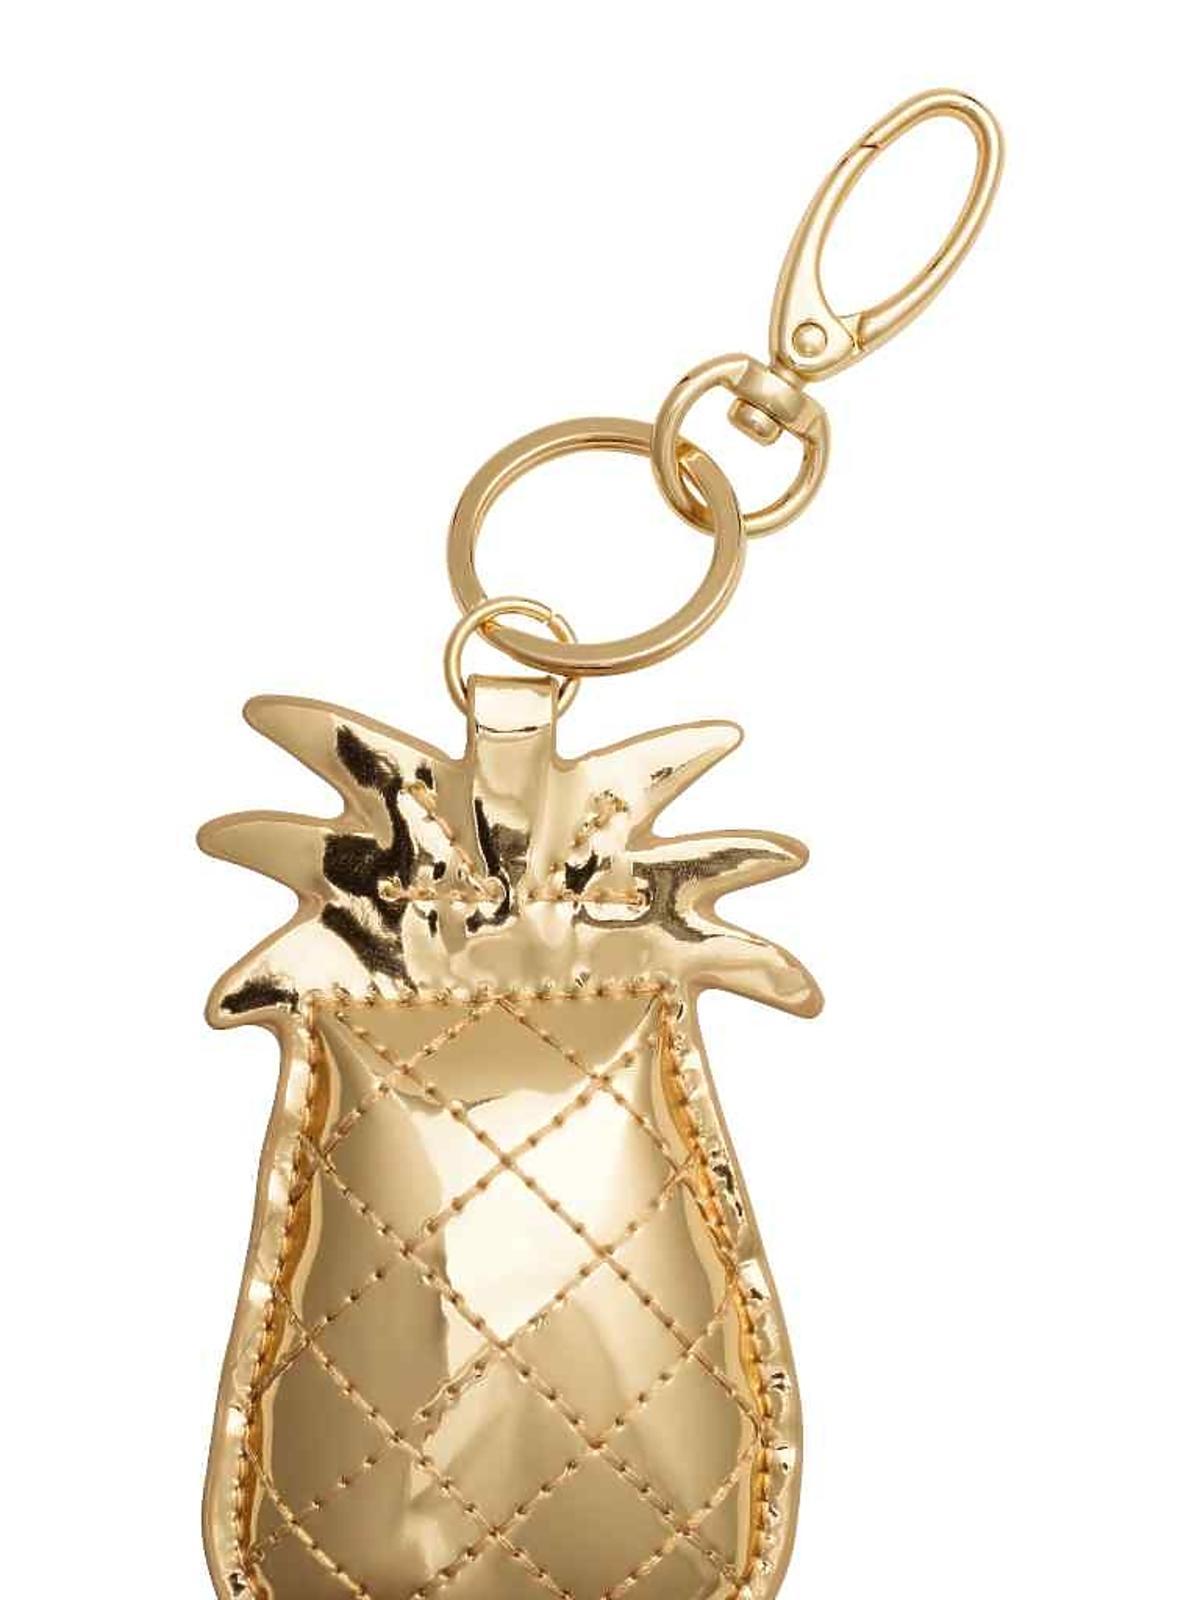 Brelok do torebki, kluczy ananas, H&M, cena: 19,90 zł